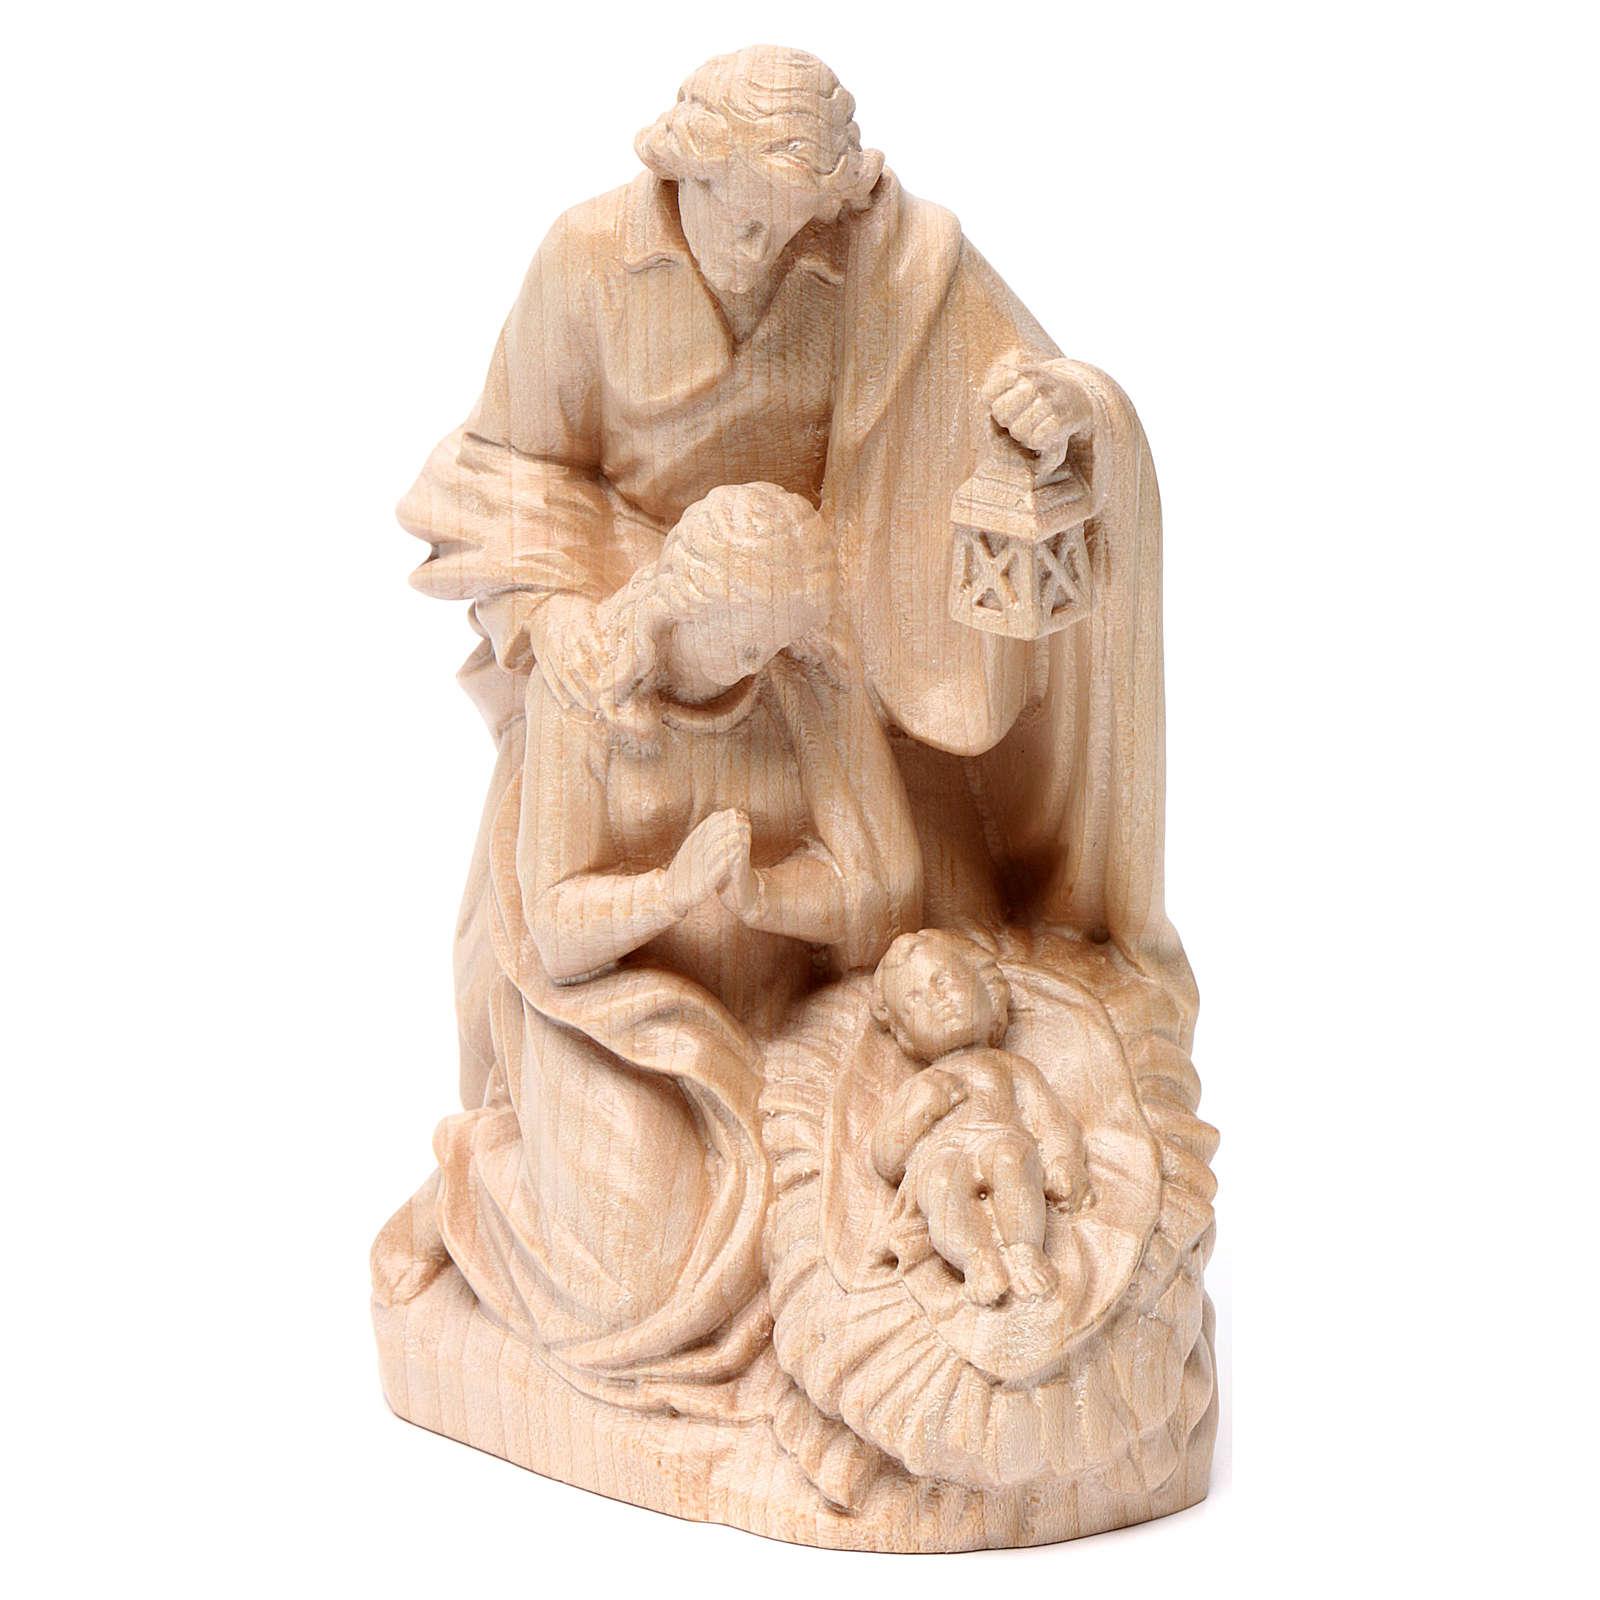 Sagrada Família grupo madeira Val Gardena natural encerada 3